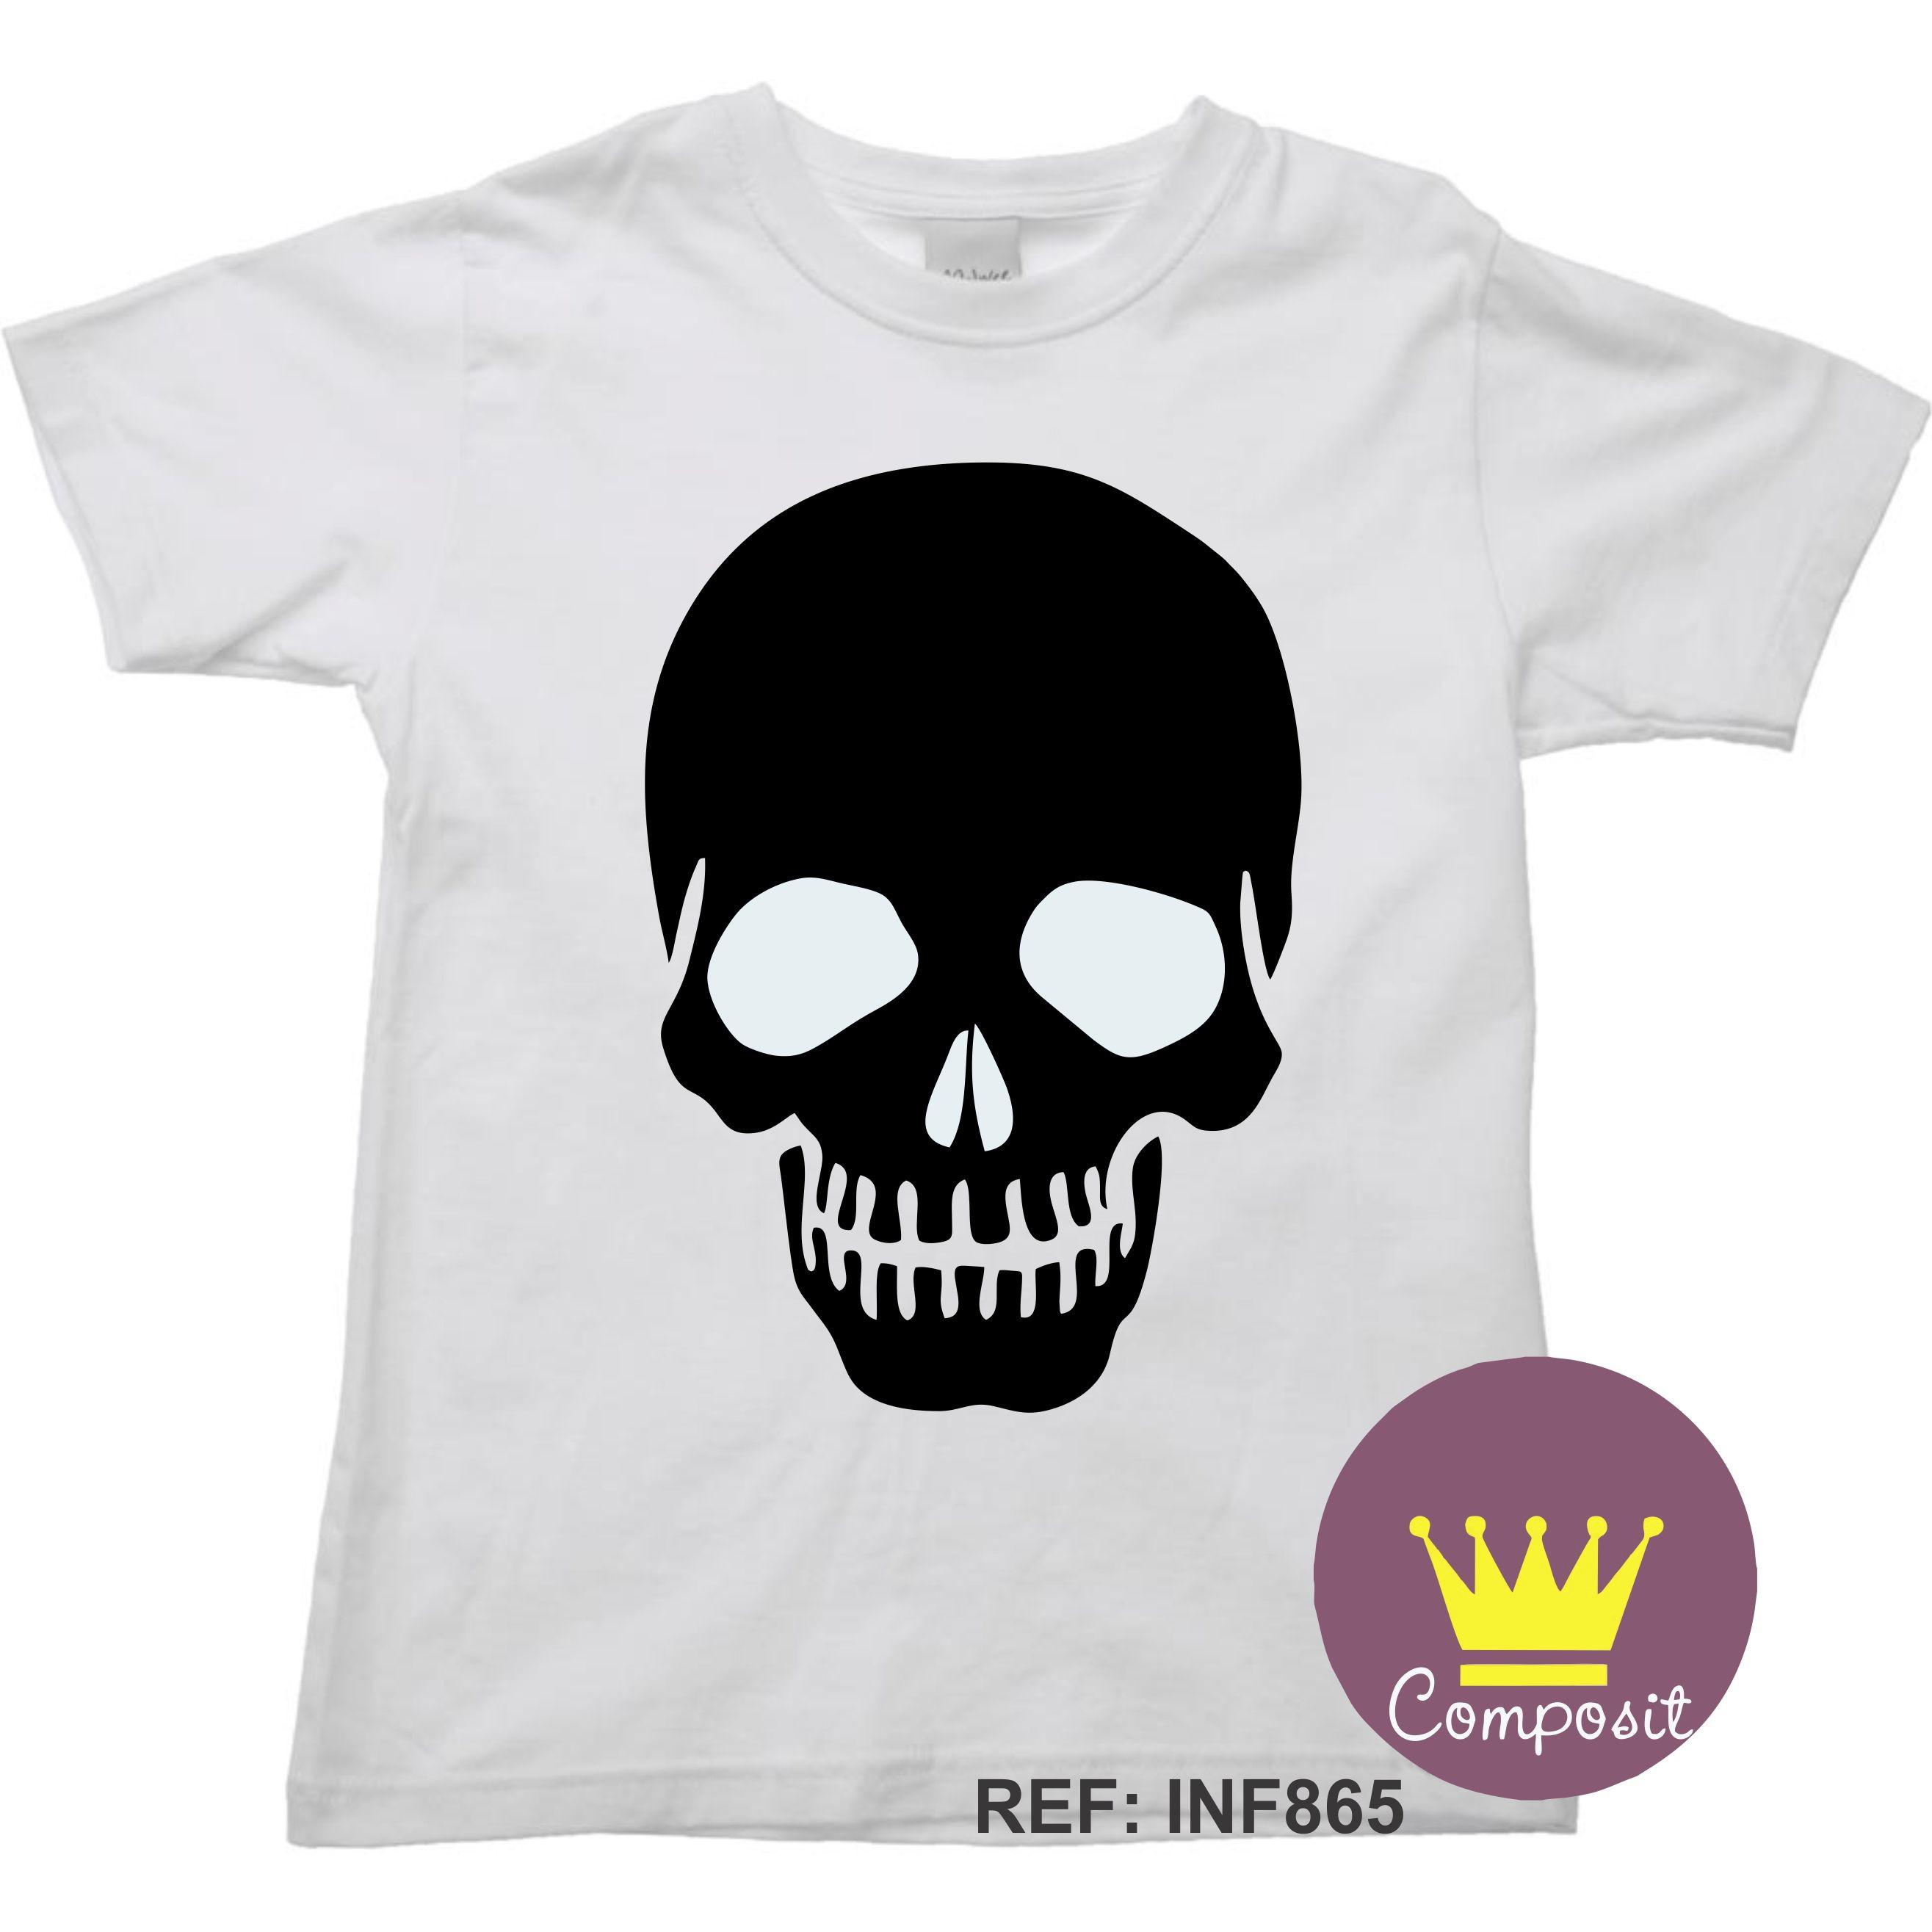 08b060a5a Camiseta Caveira Americana Raglan no Elo7